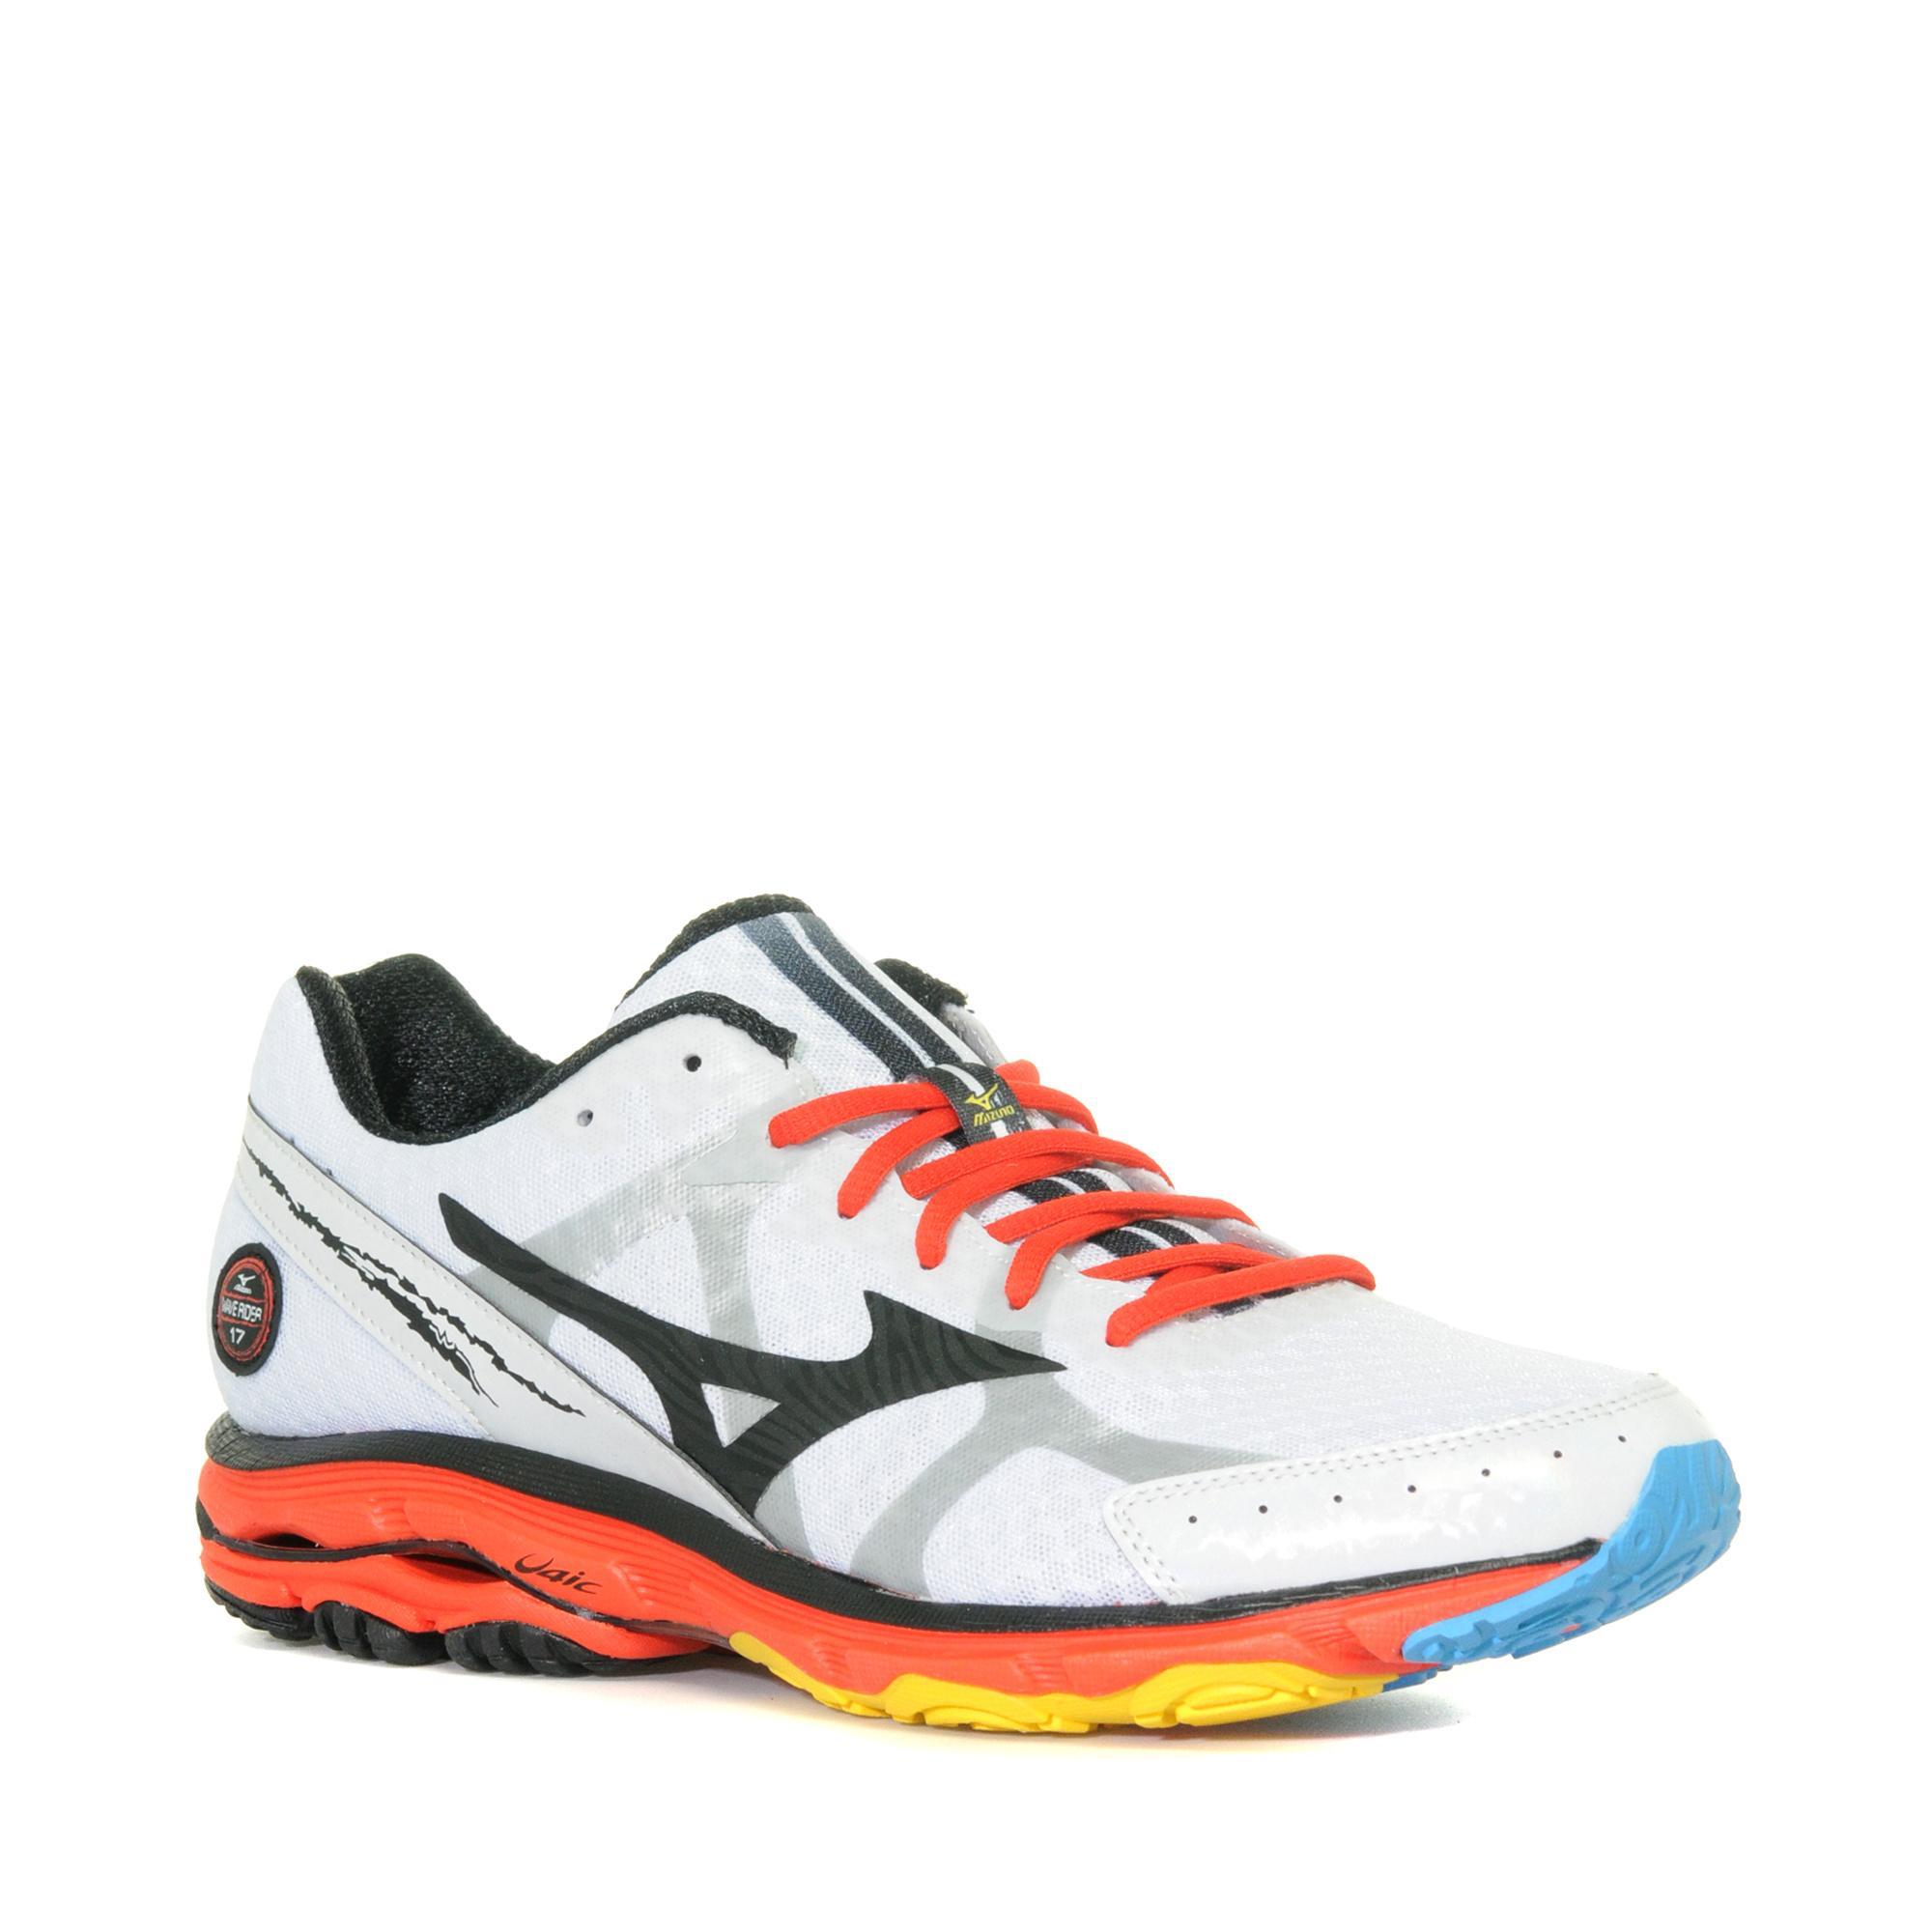 Mizuno Men's Wave Rider 17 Trail Running Shoe, White